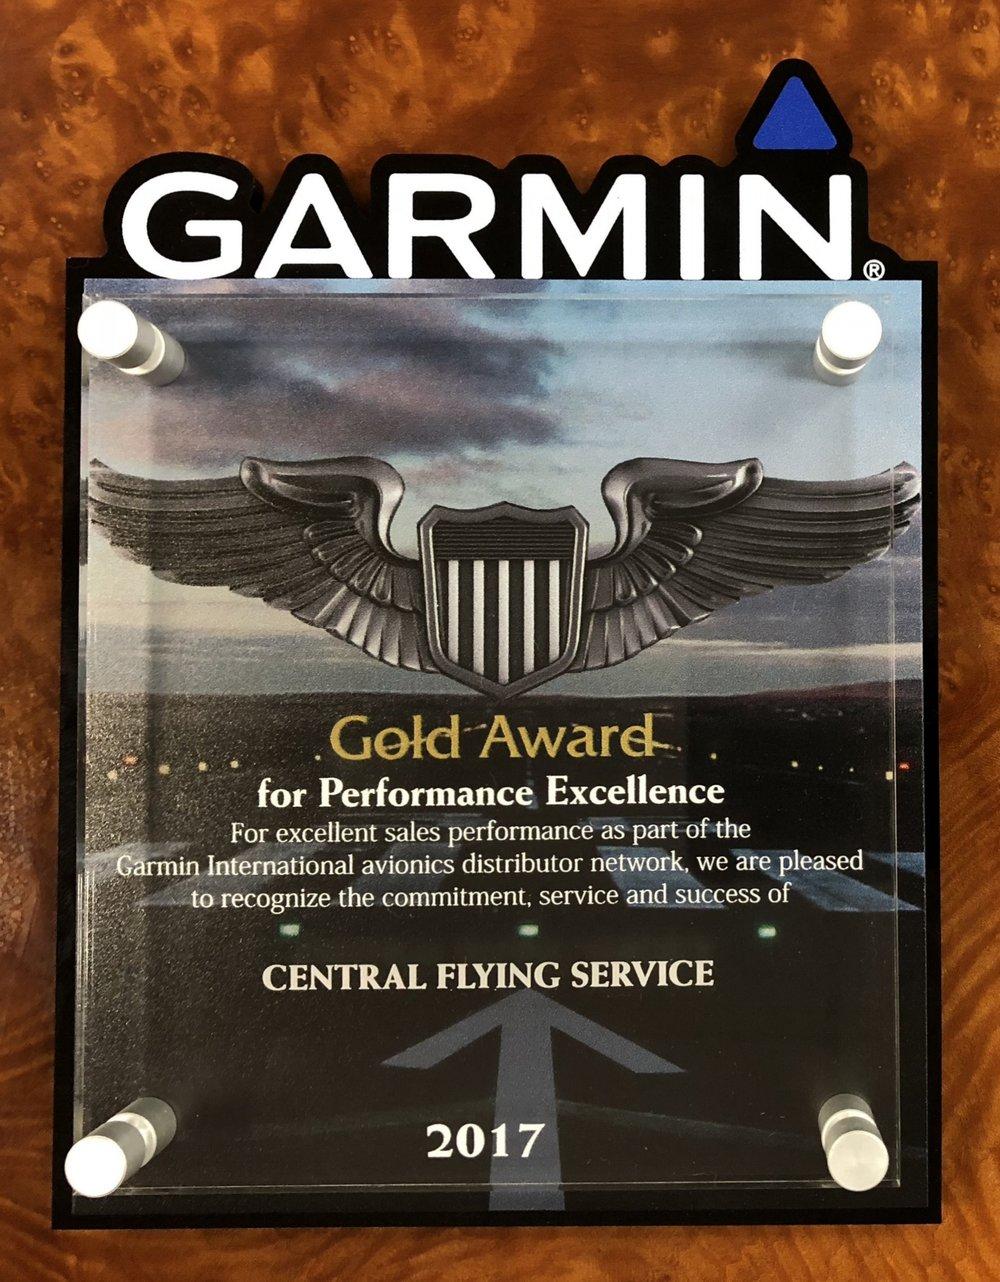 One of Garmin's most prestigious awards: Central's Award Winning Avionics Shop lands in the Top 10% of Garmin Distributors Worldwide.